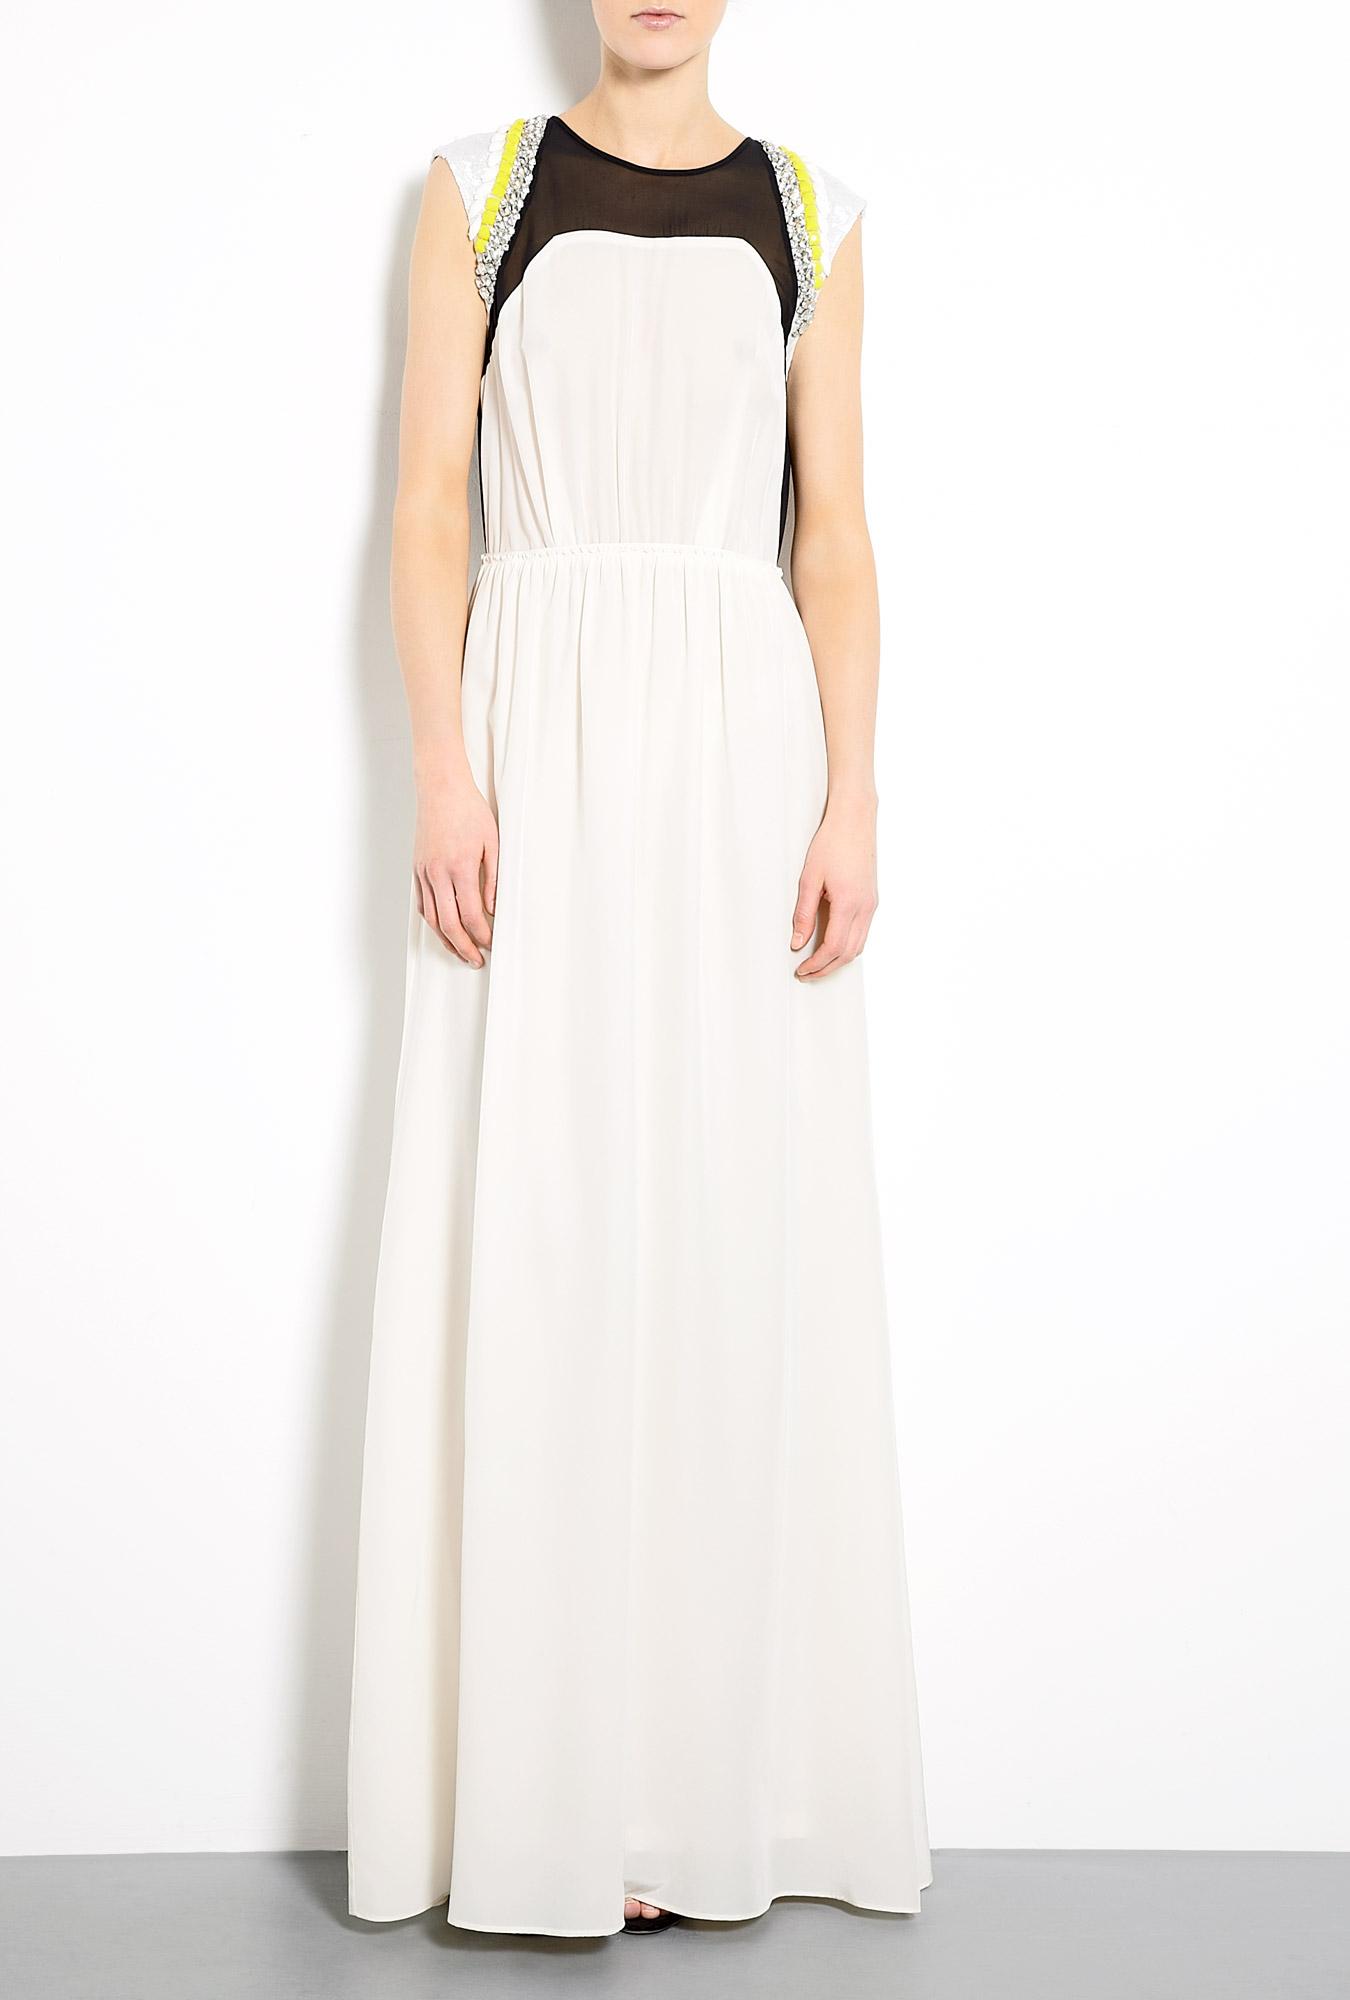 malene birger dress